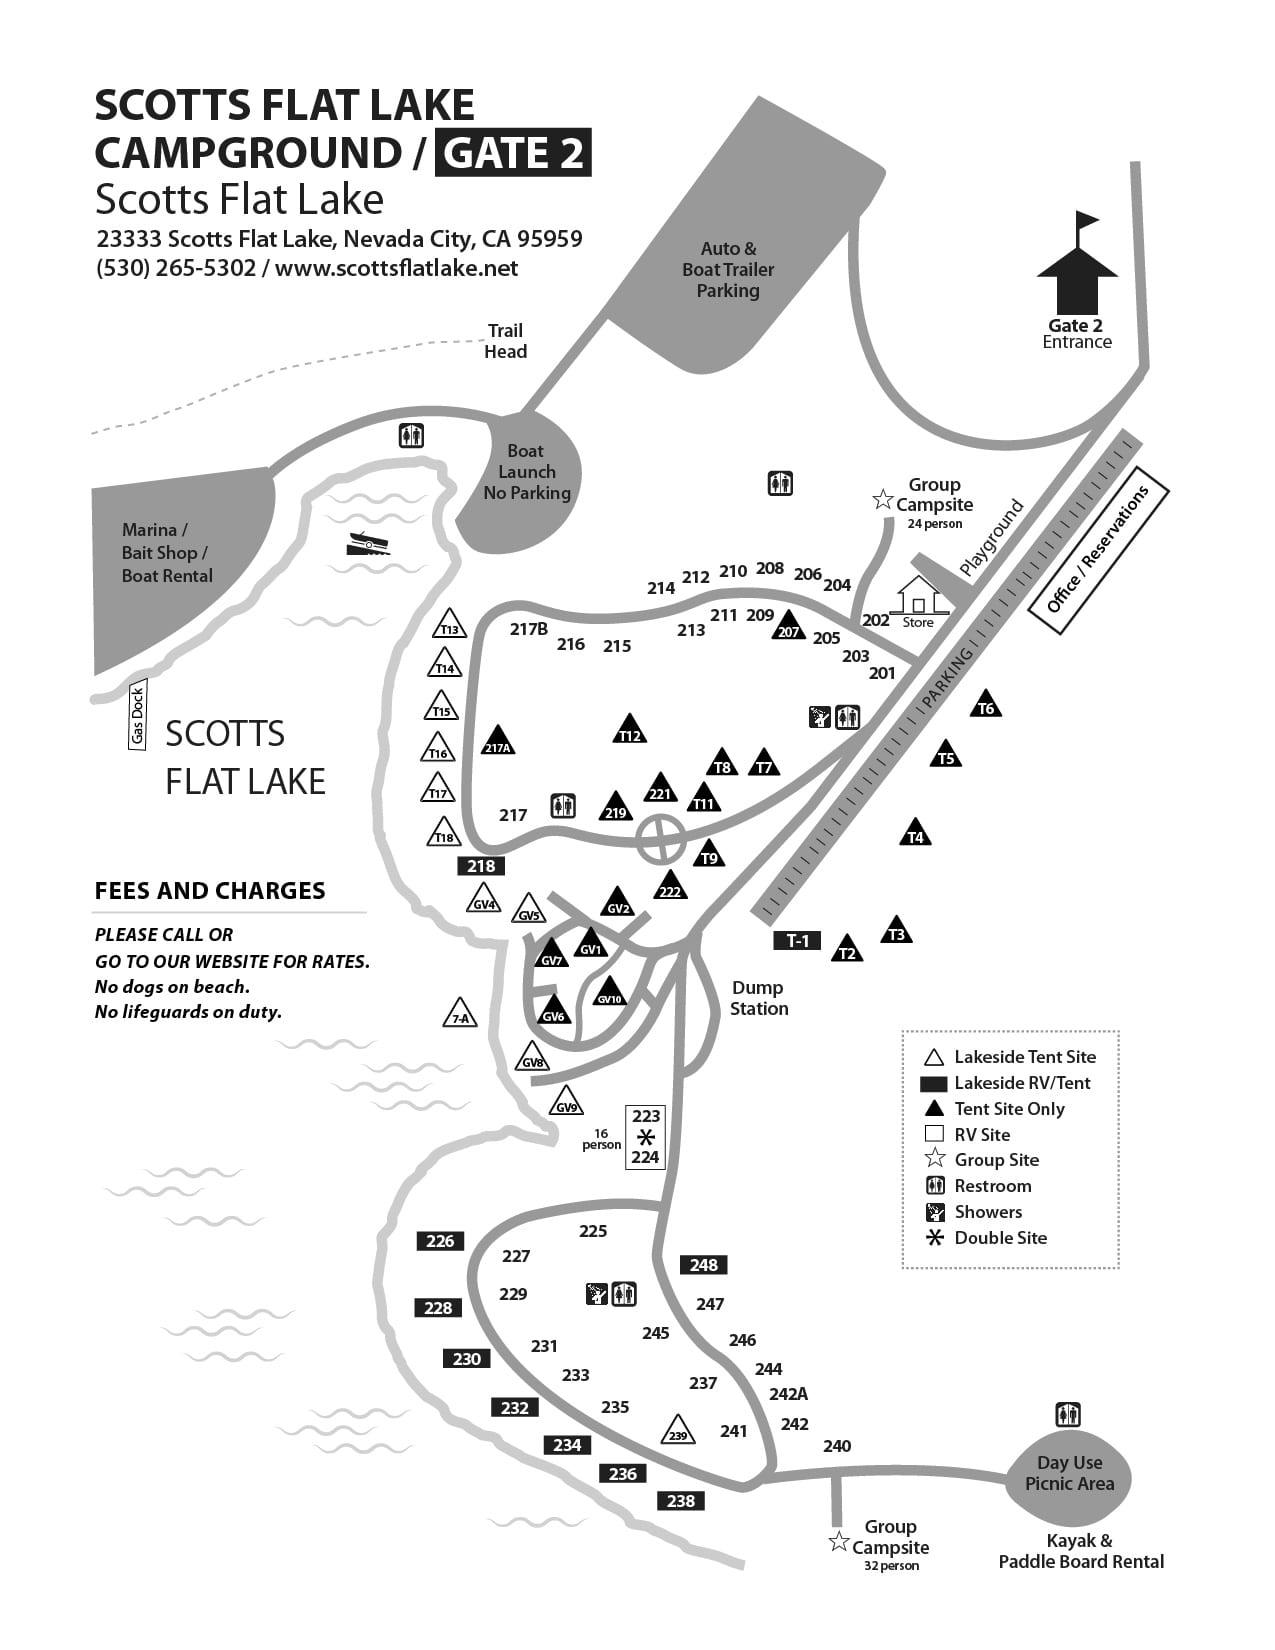 scotts flat lake map Scotts Flat Lake Campground Maps Nid Recreation scotts flat lake map